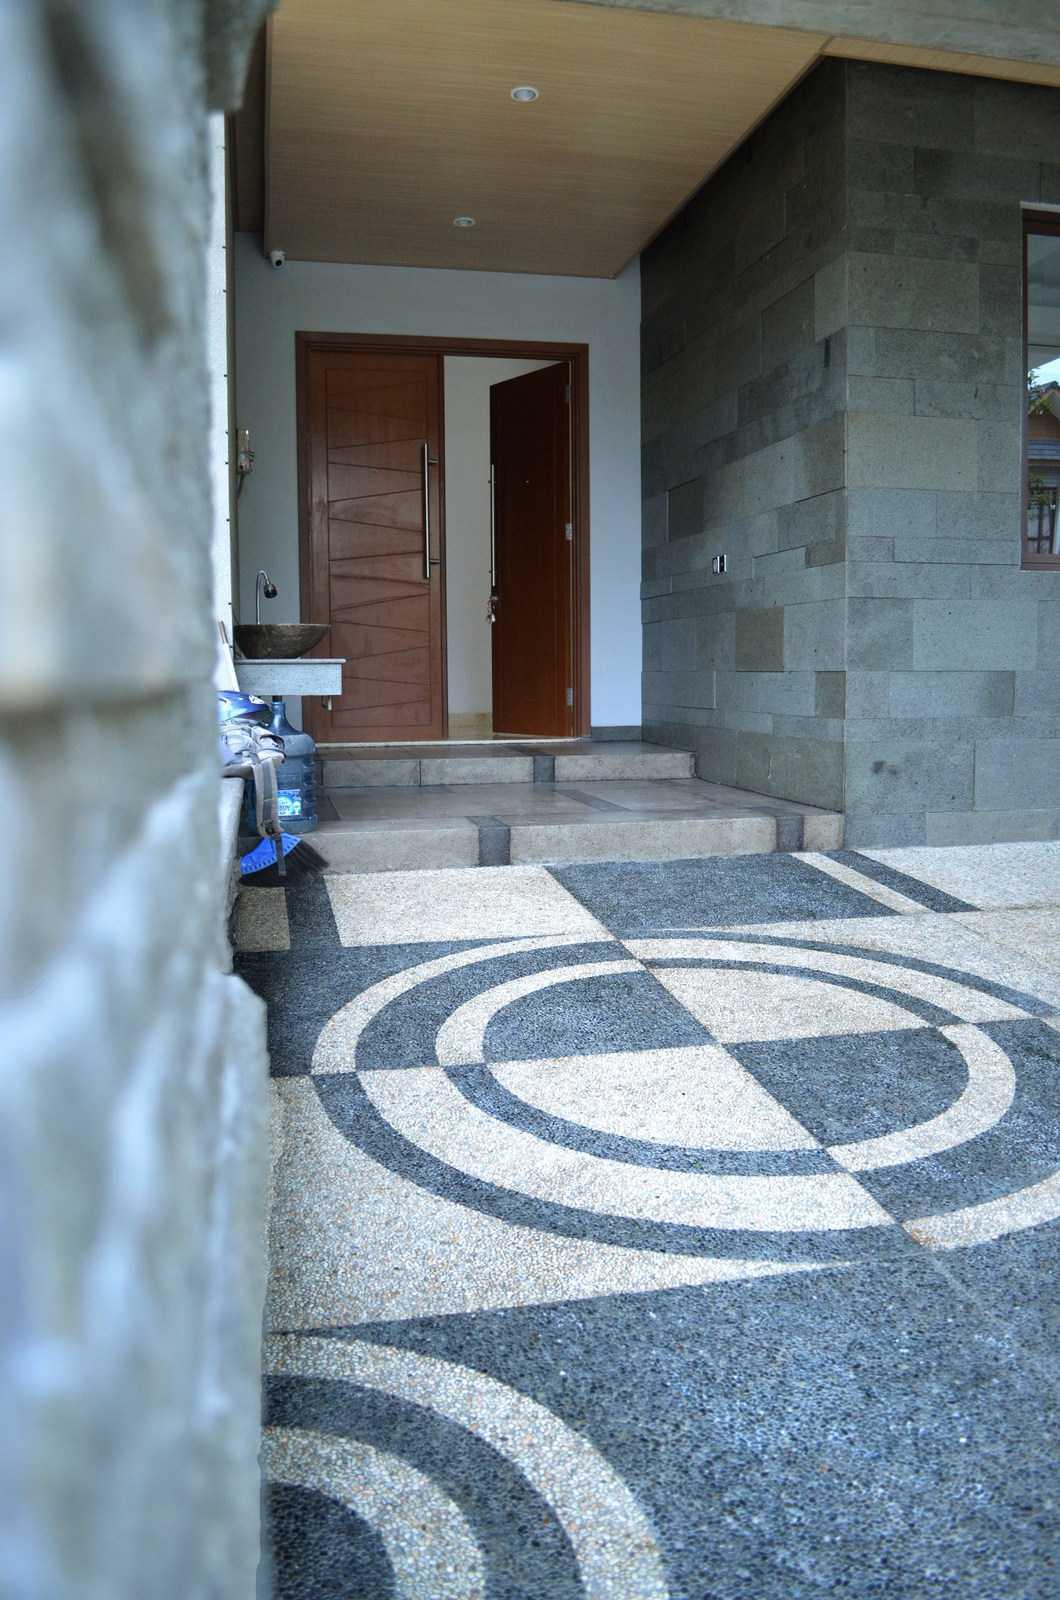 X3M Architects Nittaya A3 15 House Bsd Bsd Front View   25312